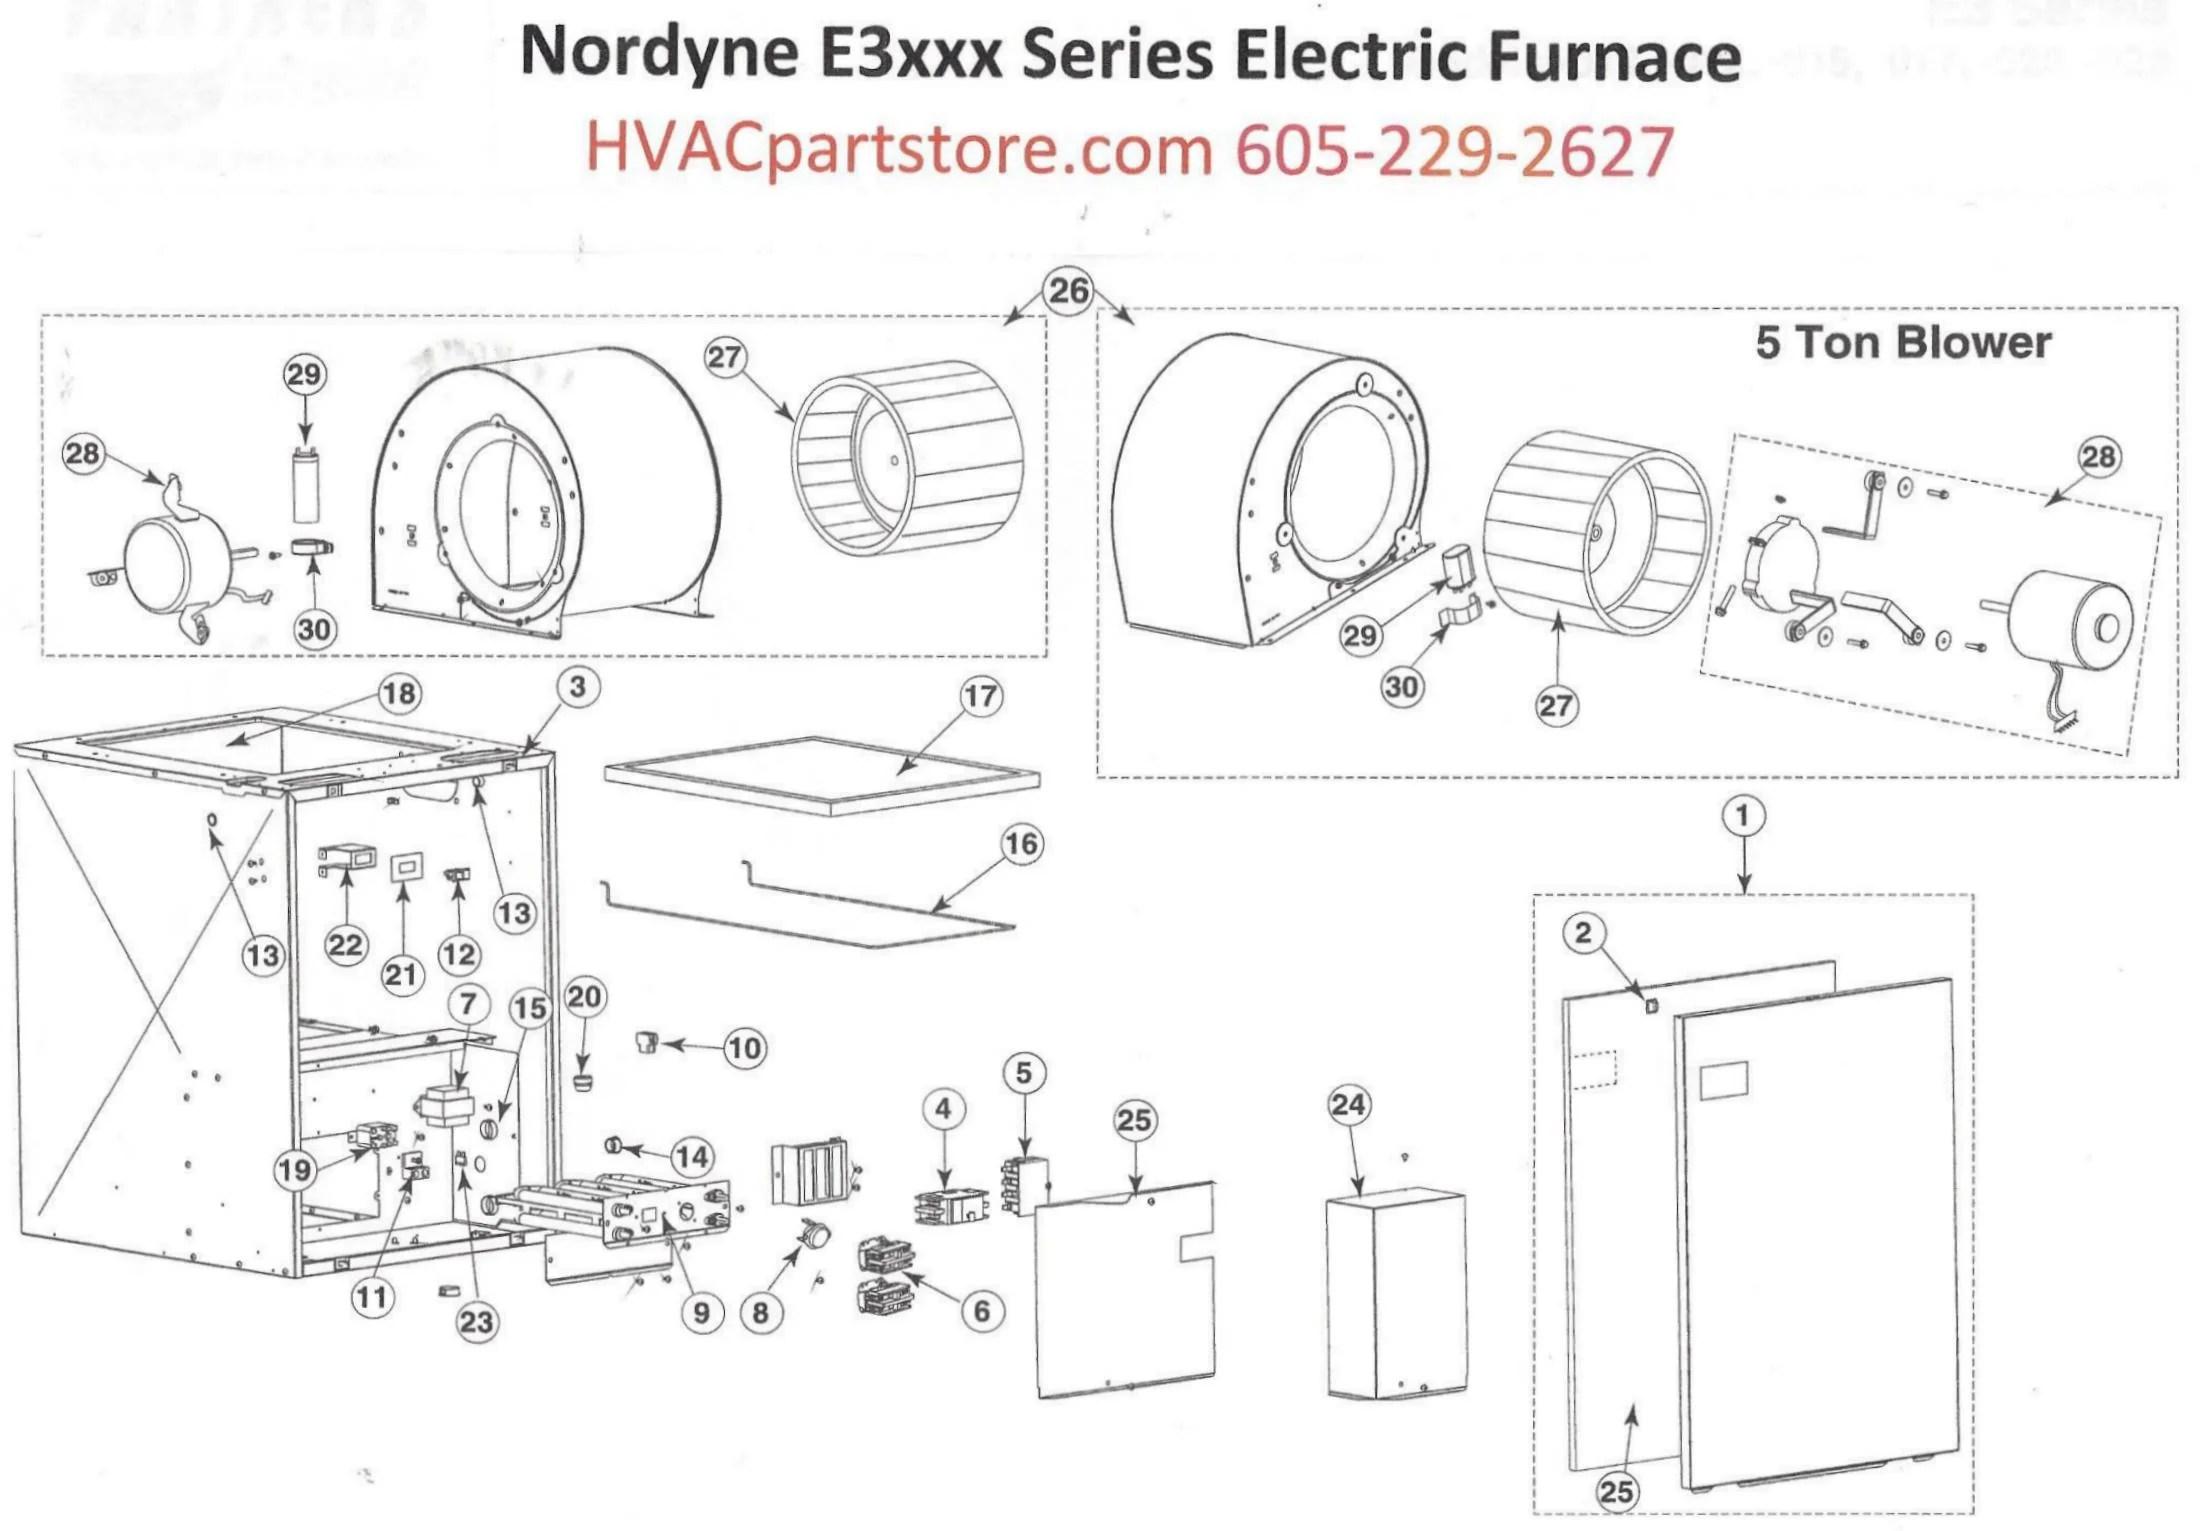 Nordyne Furnace Wiring Diagram E2eb 012ha